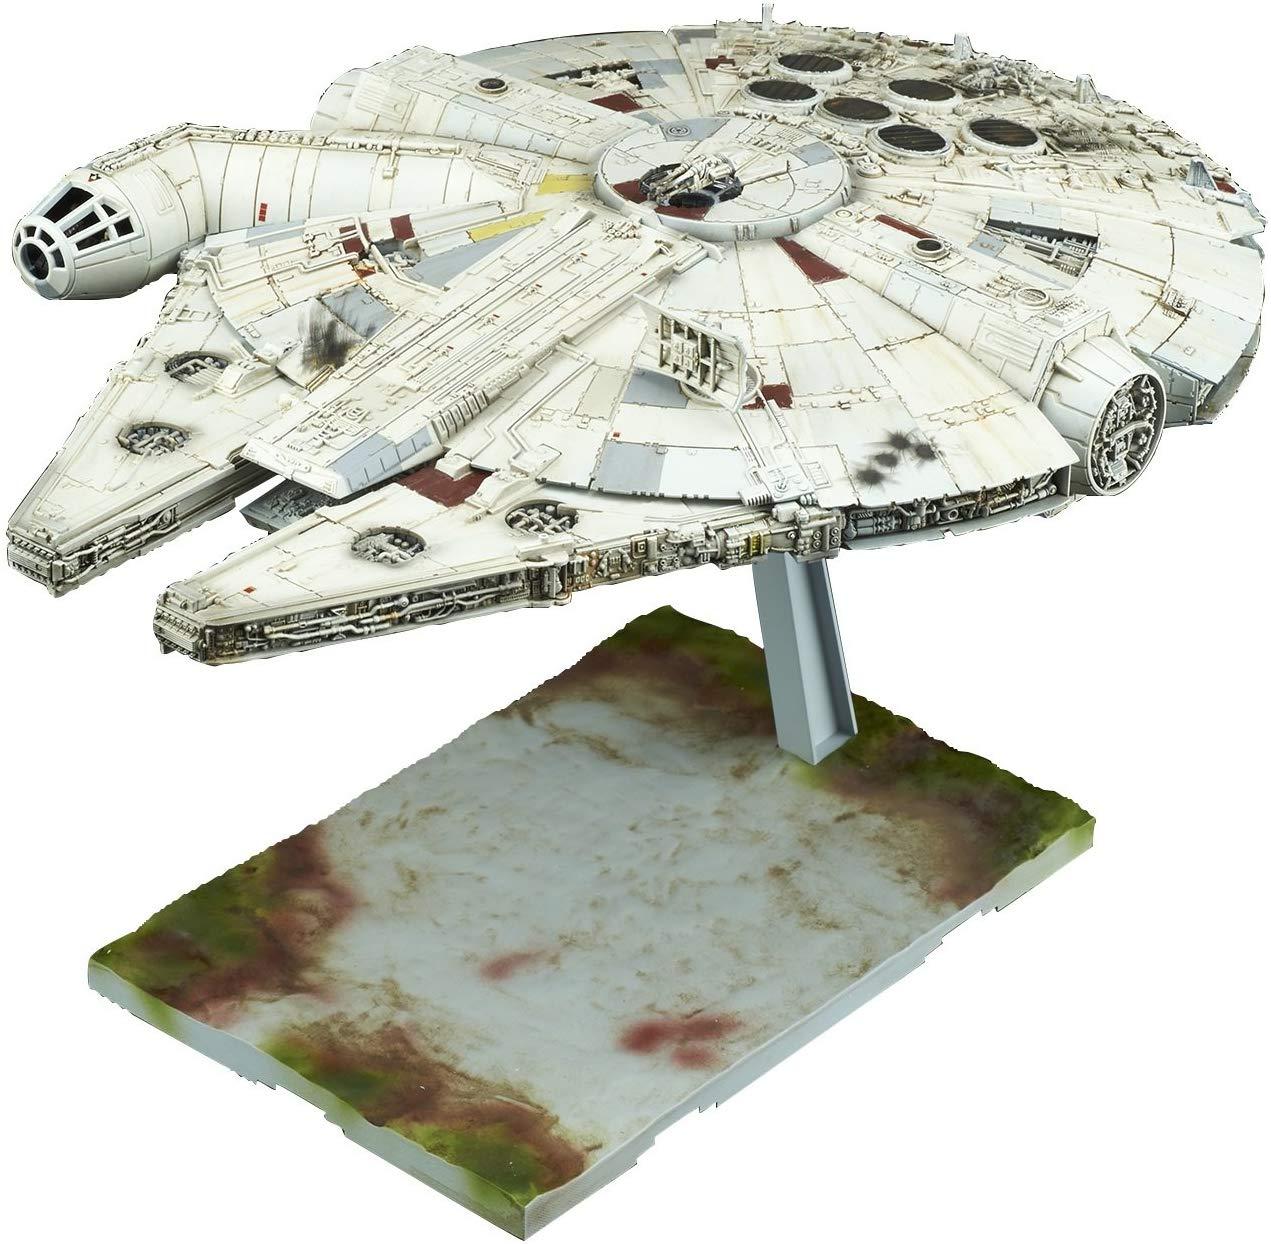 Bandai Hobby 1/144 Millennium Falcon Star Wars: The Last Jedi Model $24 @ Amazon